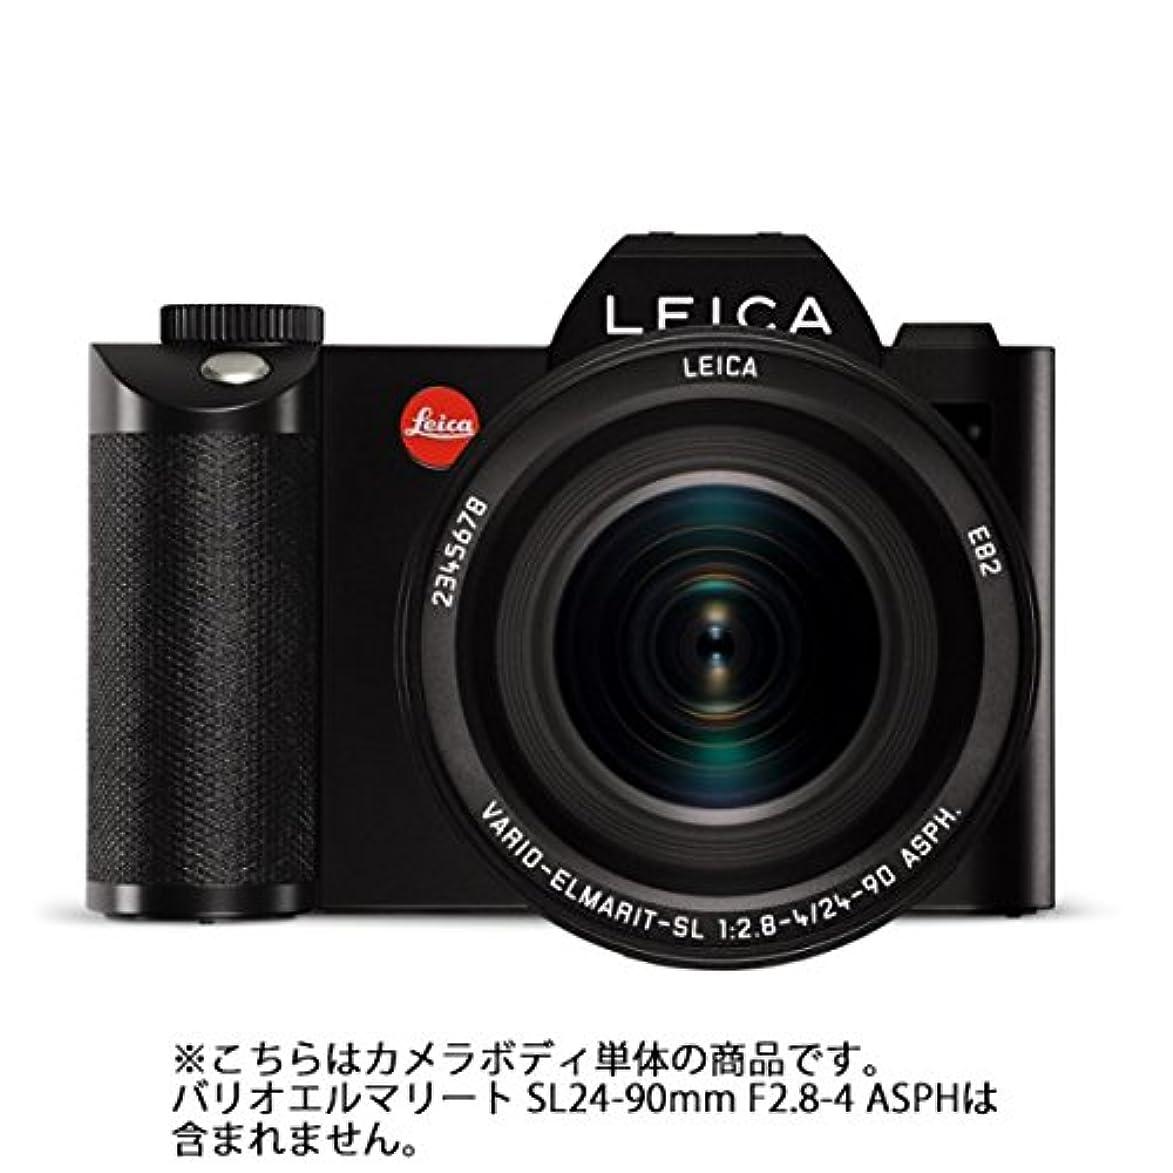 Leica SL (Typ 601) Mirrorless Digital Camera with Vario-Elmarit-SL 24-90mm f/2.8-4 ASPH. Lens